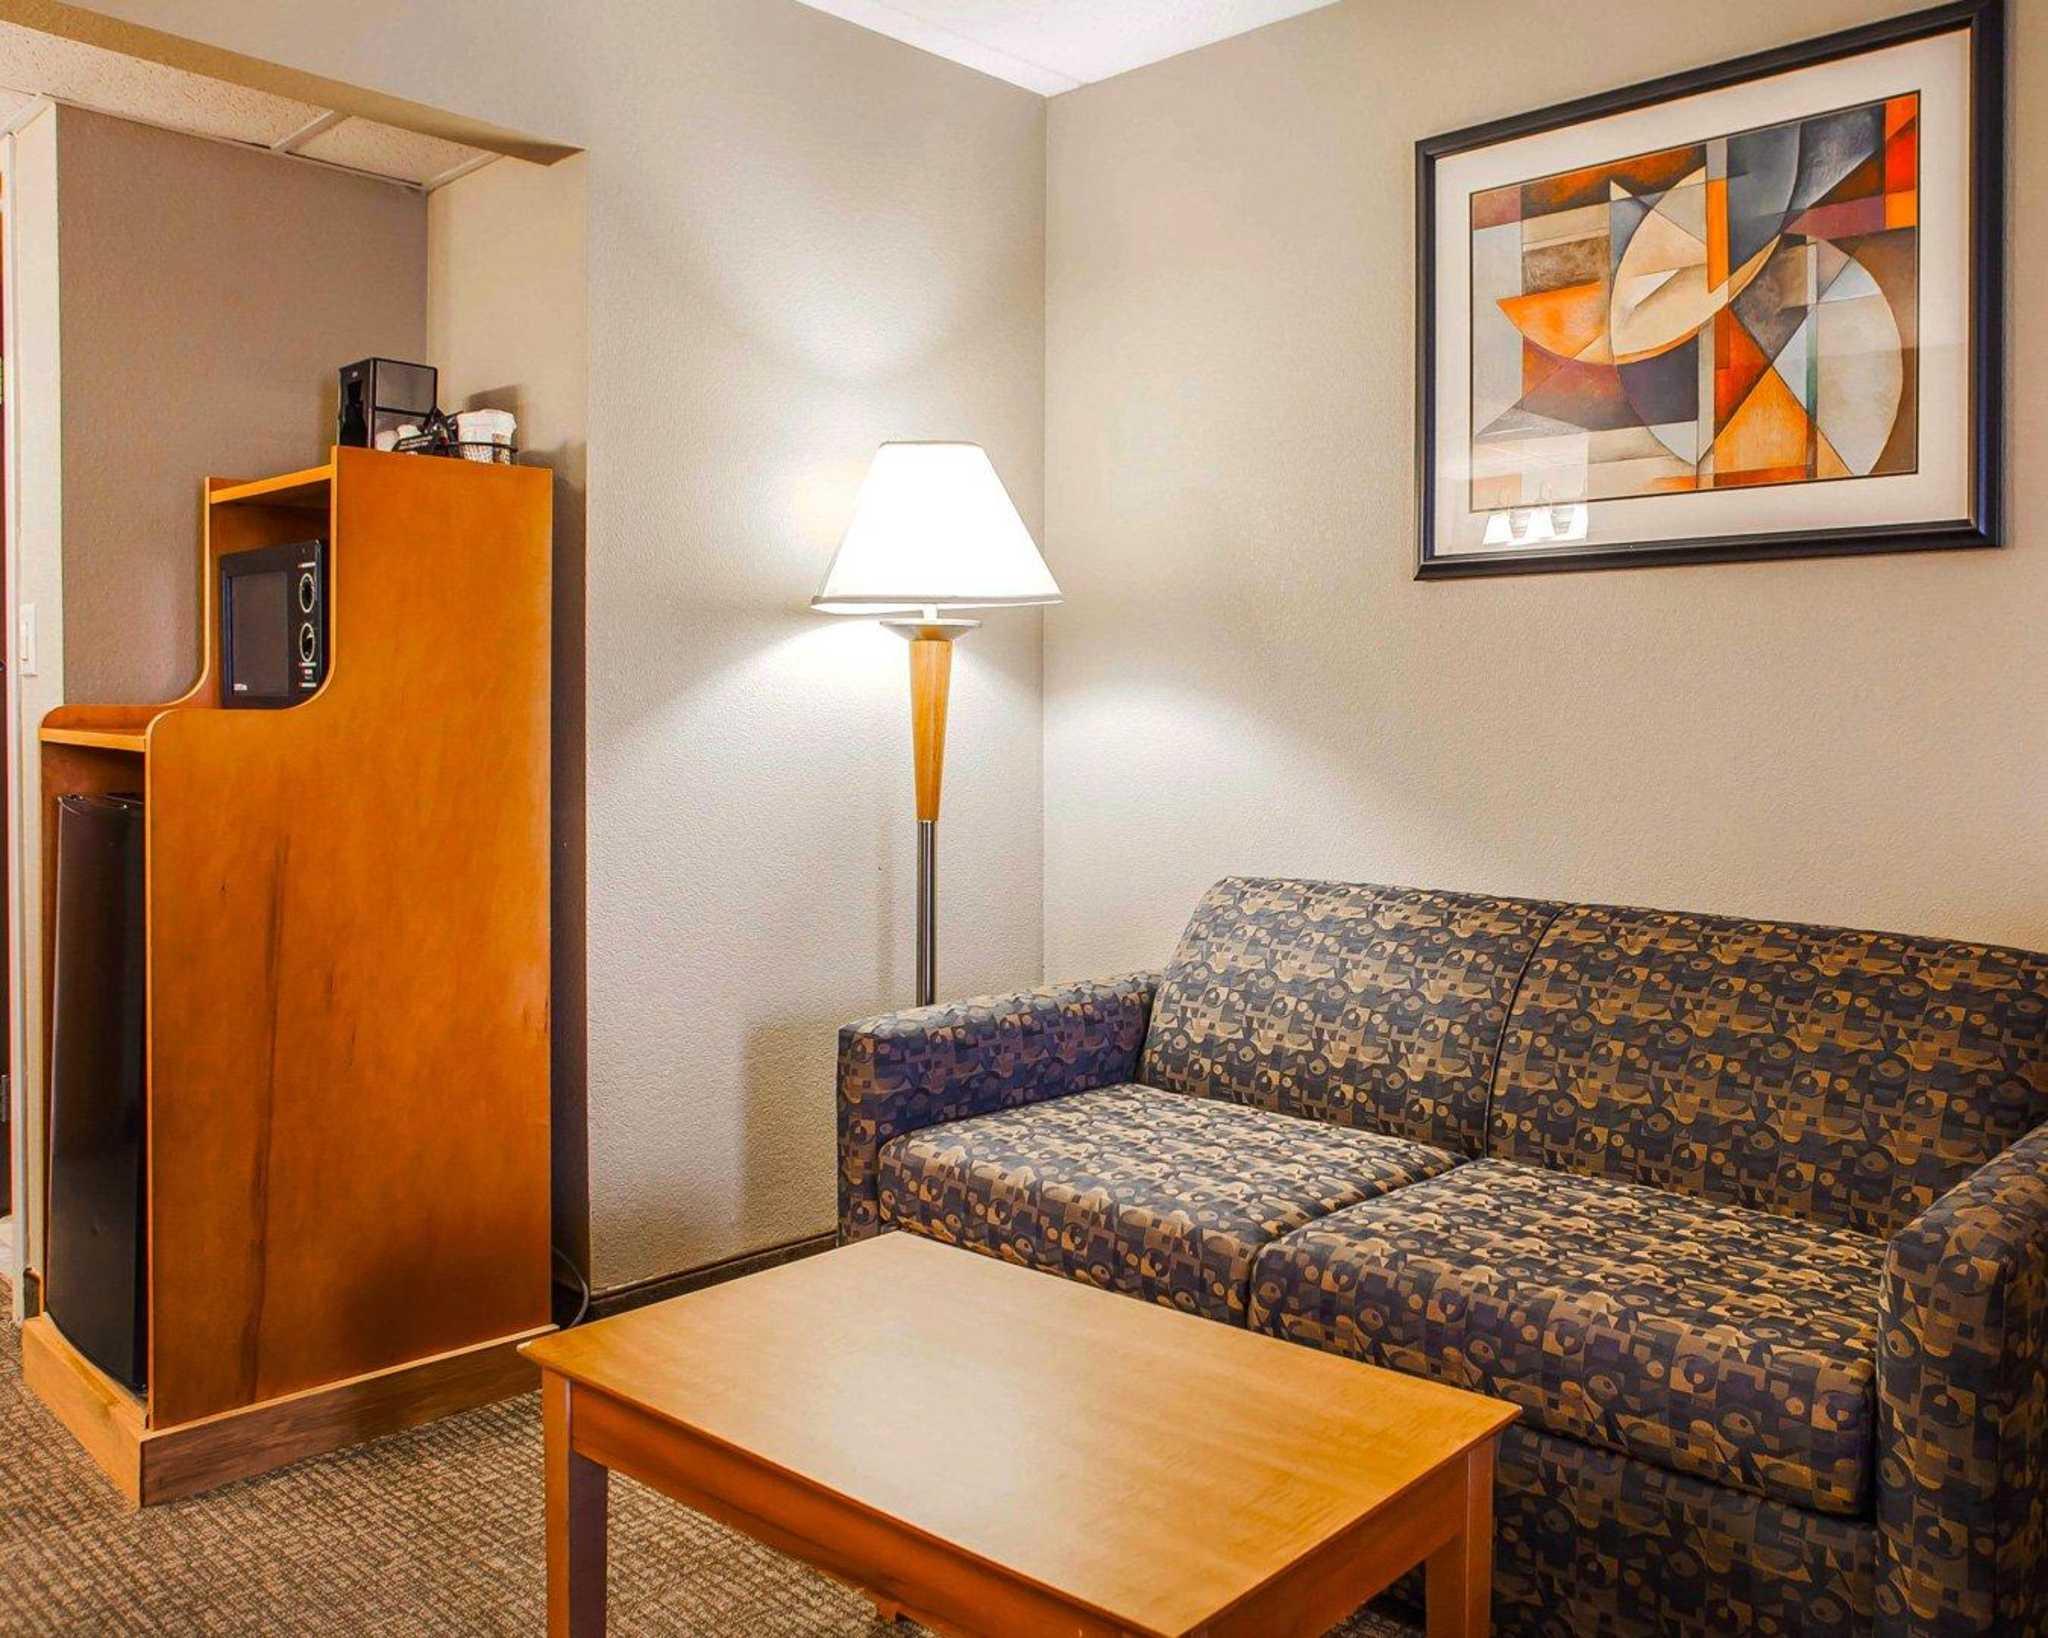 Comfort Suites image 21